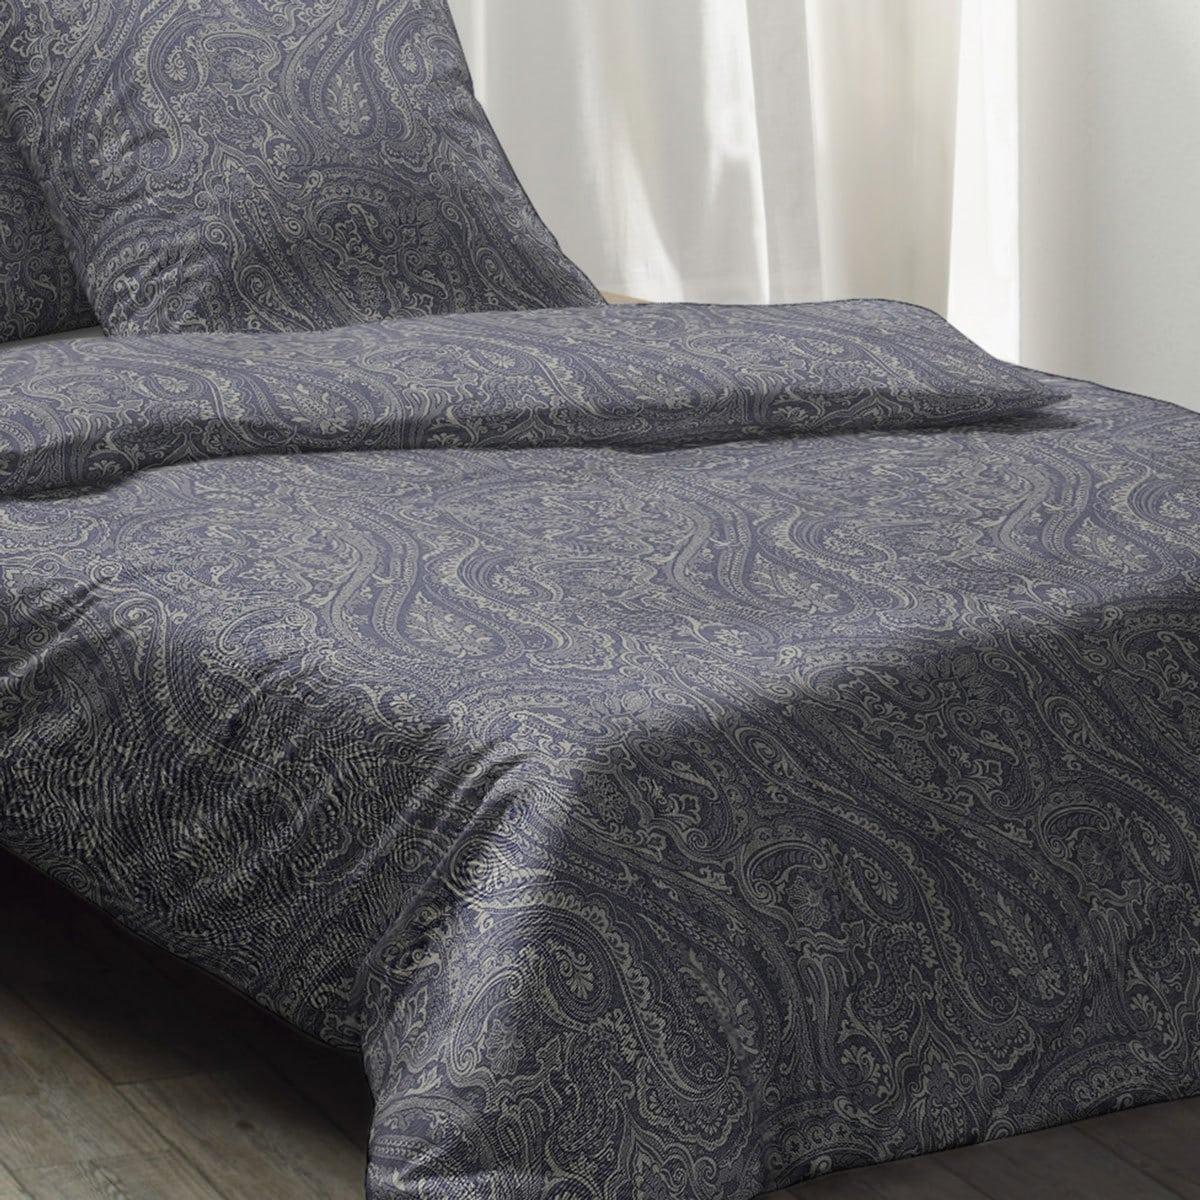 fleuresse edelflanell bettw sche paisley 603868 02 marine g nstig online kaufen bei bettwaren shop. Black Bedroom Furniture Sets. Home Design Ideas